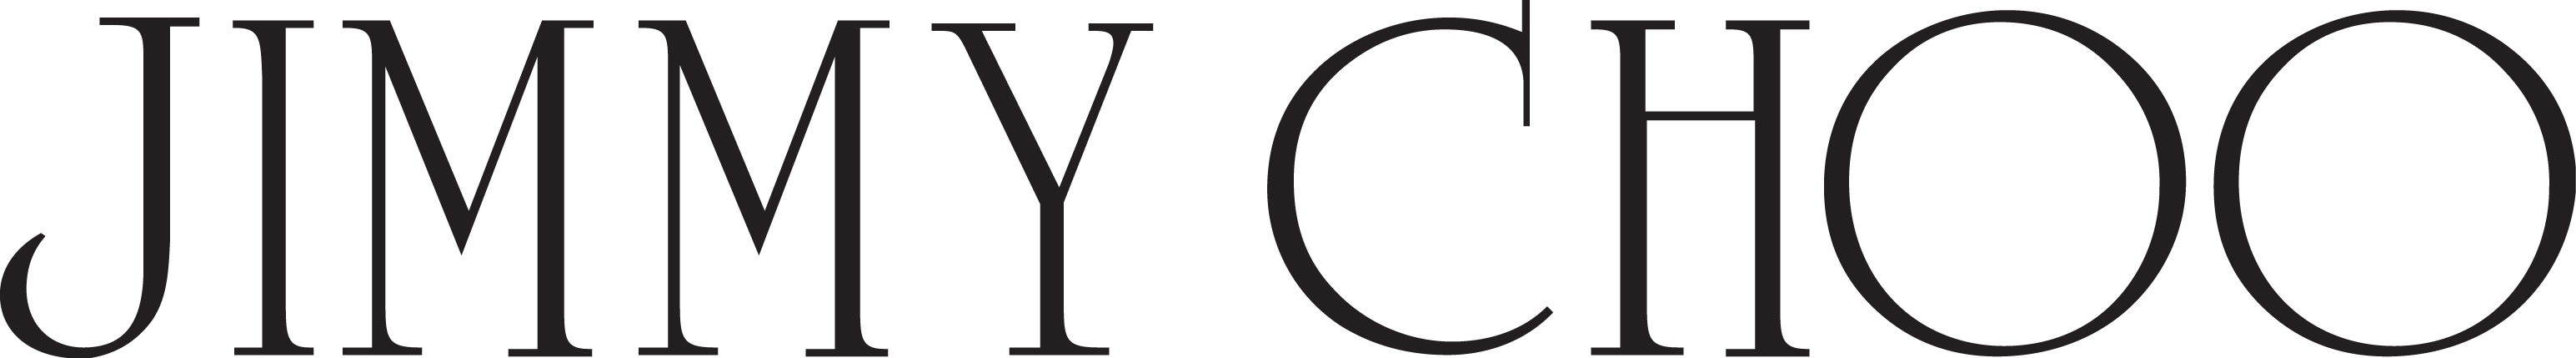 Jimmy Choo Logo png